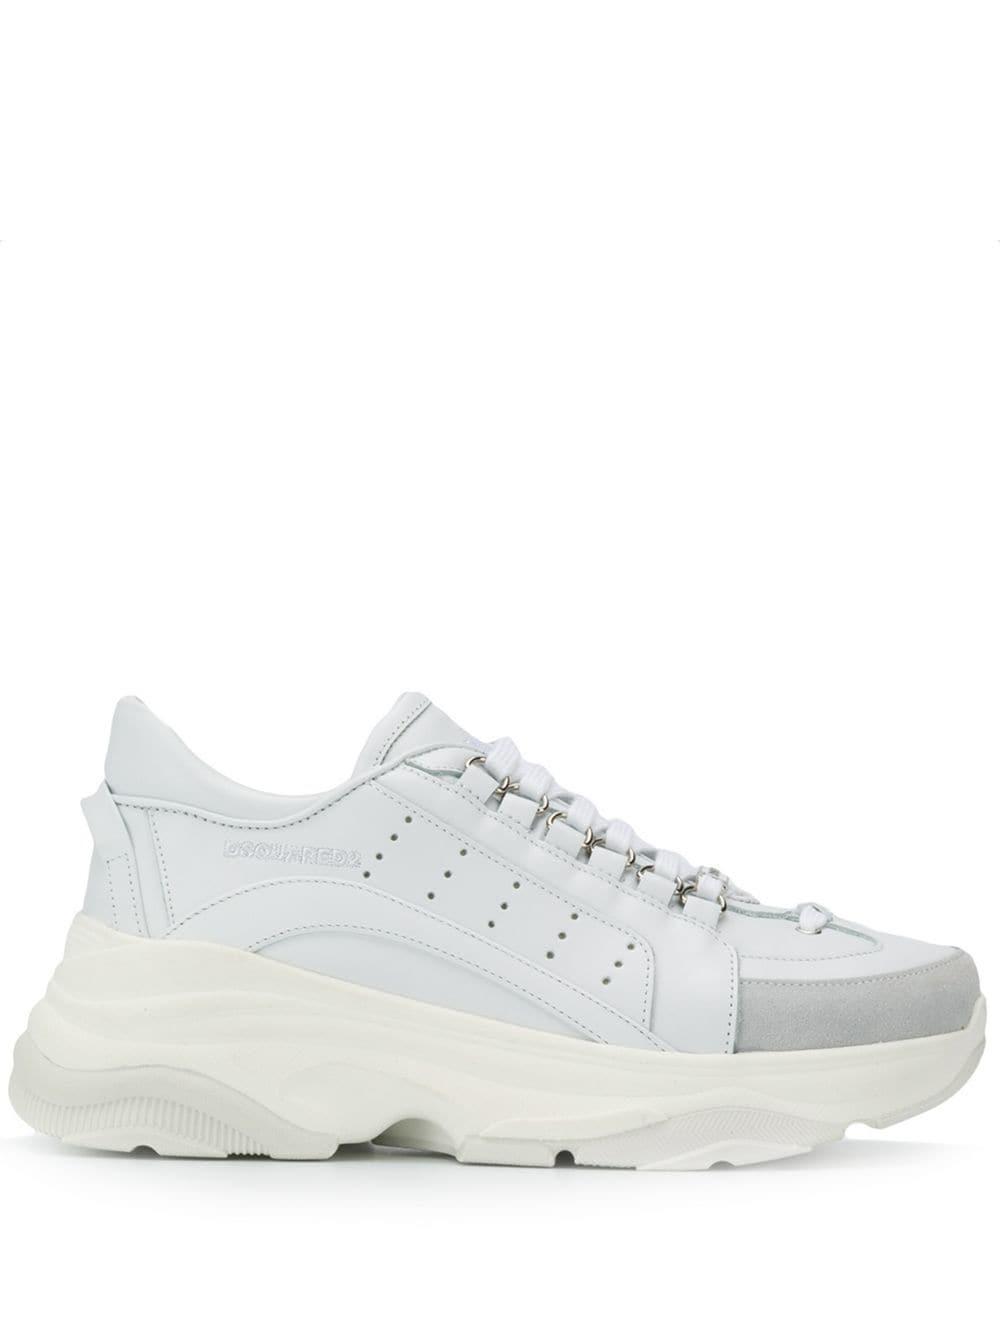 38aca982733 Bumpy 551 Sneakers Dsquared2 - DSQUARED2 - Russocapri